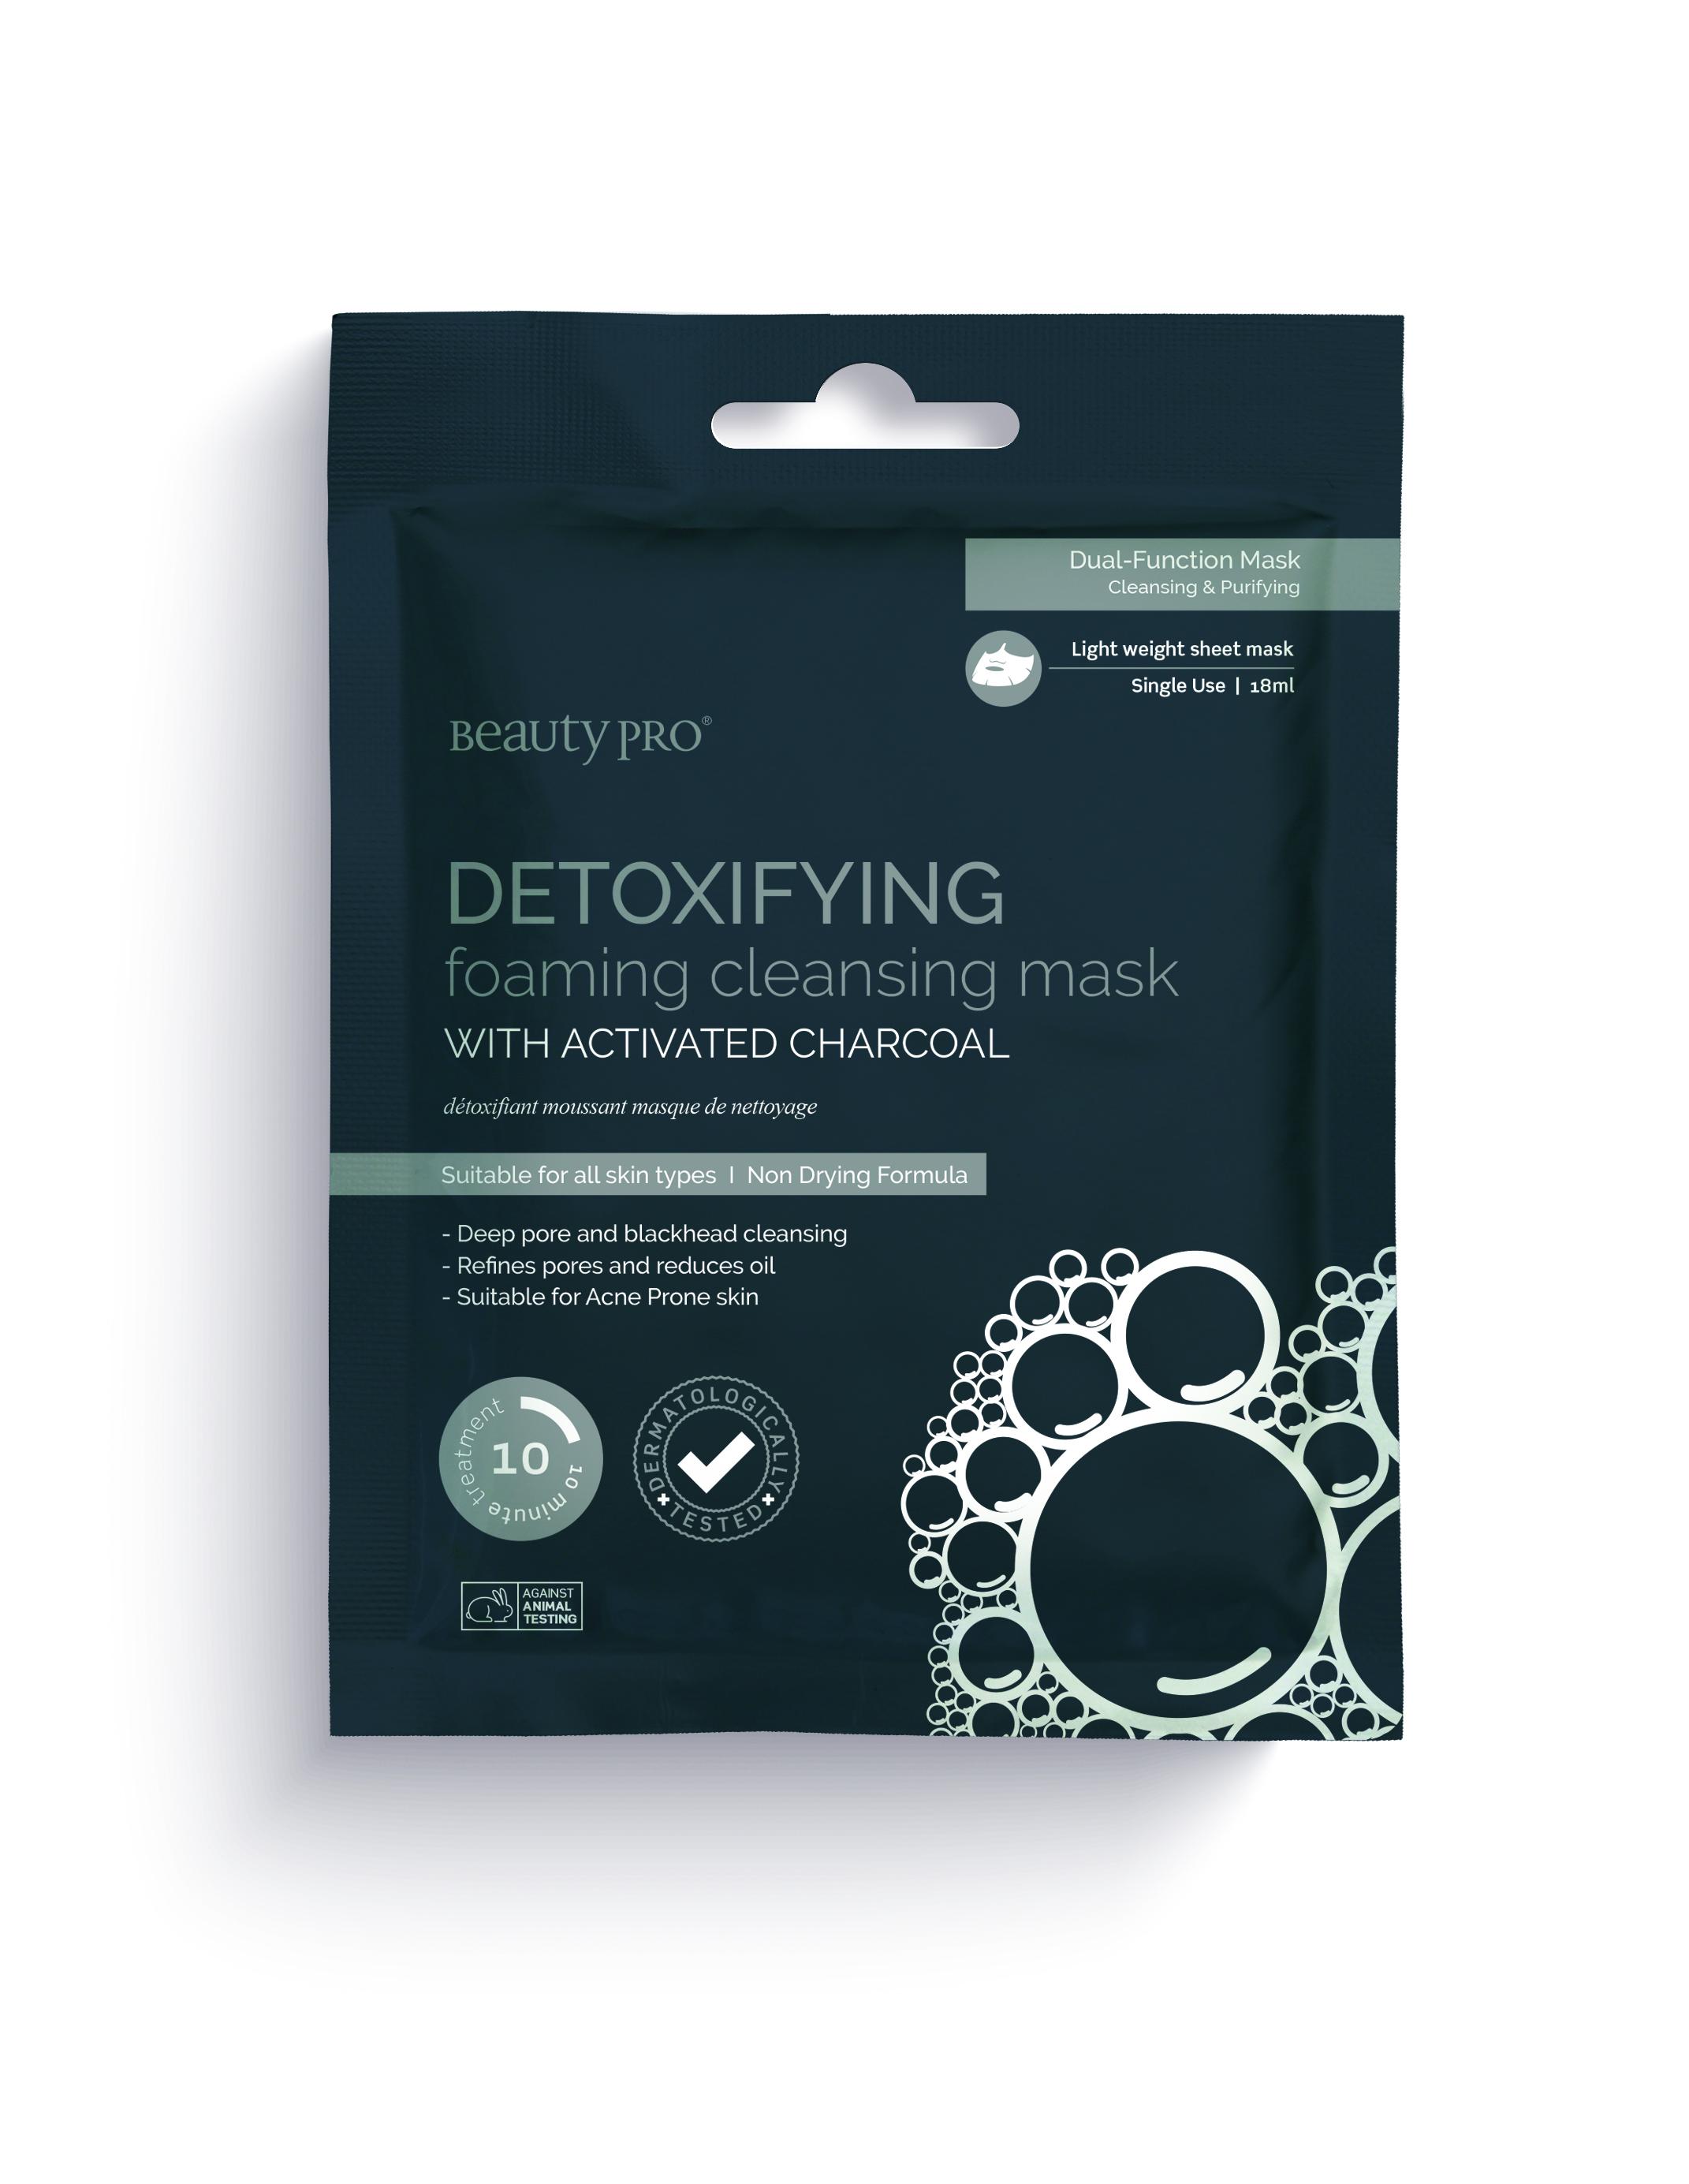 Beauty Pro Detoxifying Cleansing Mask, 18ml